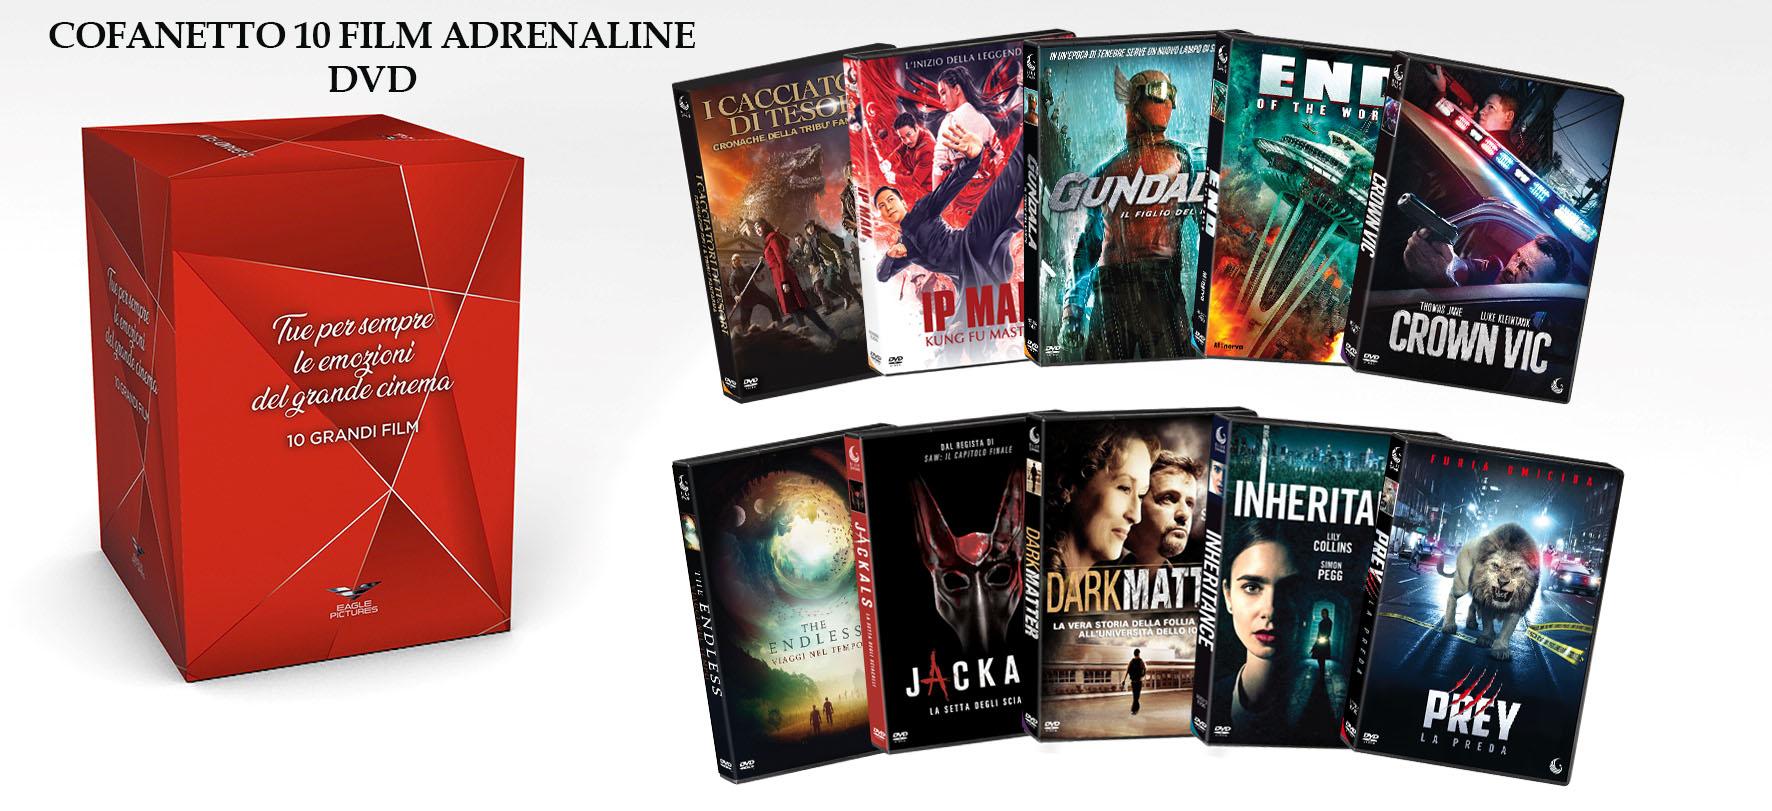 COF.ADRENALINE COFANETTO (10 DVD) (DVD)